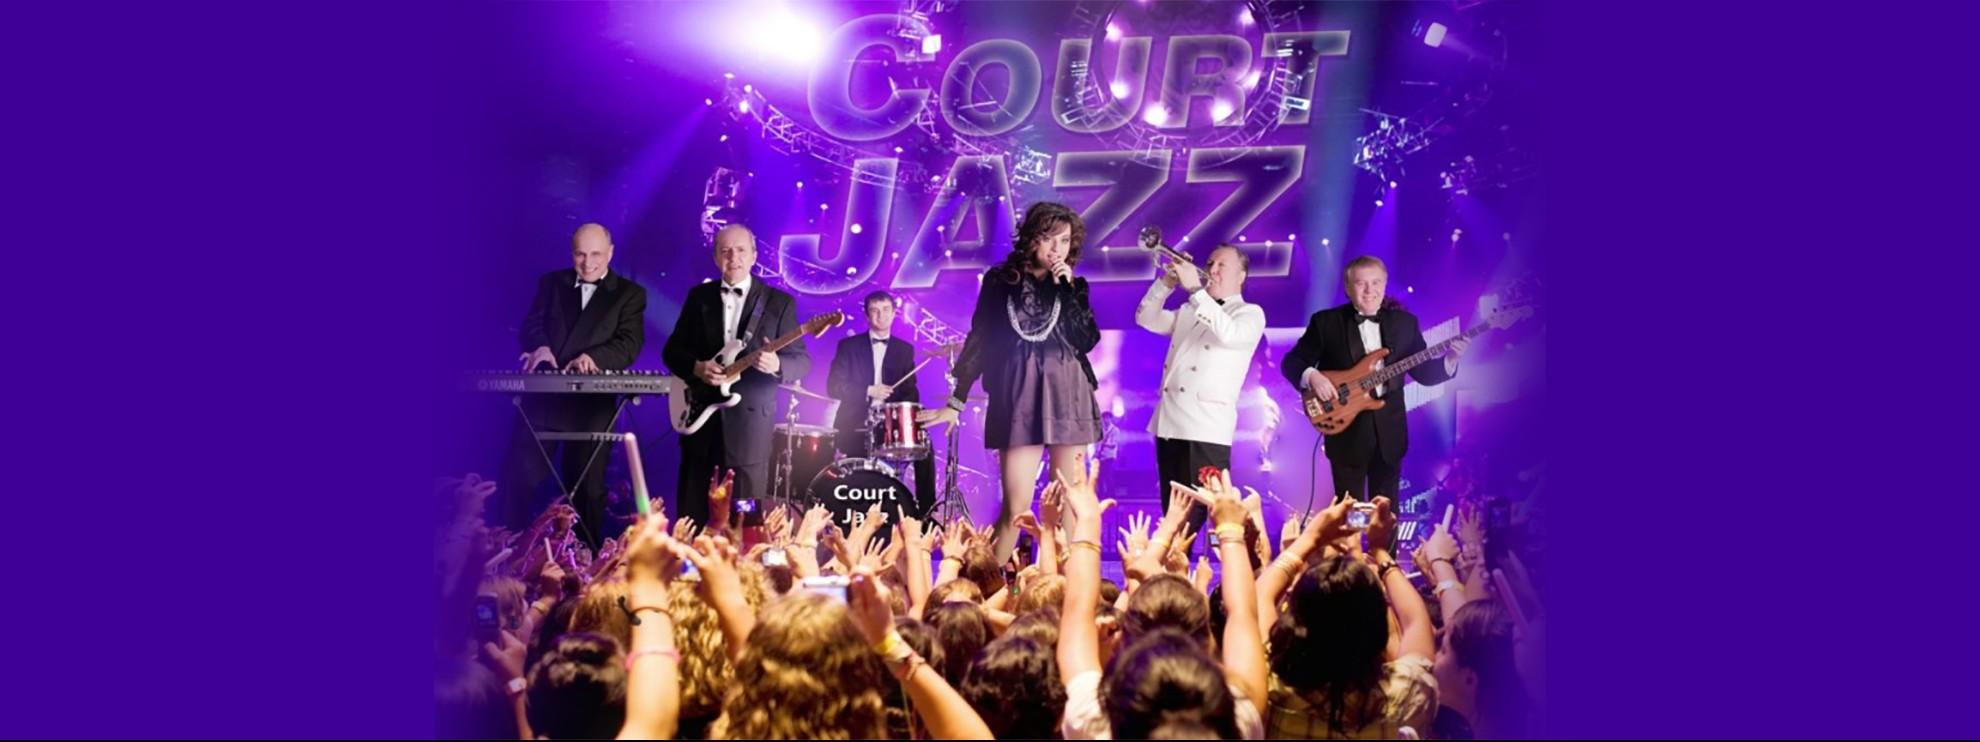 виконавець Court Jazz Band (Корт Джаз Бенд)